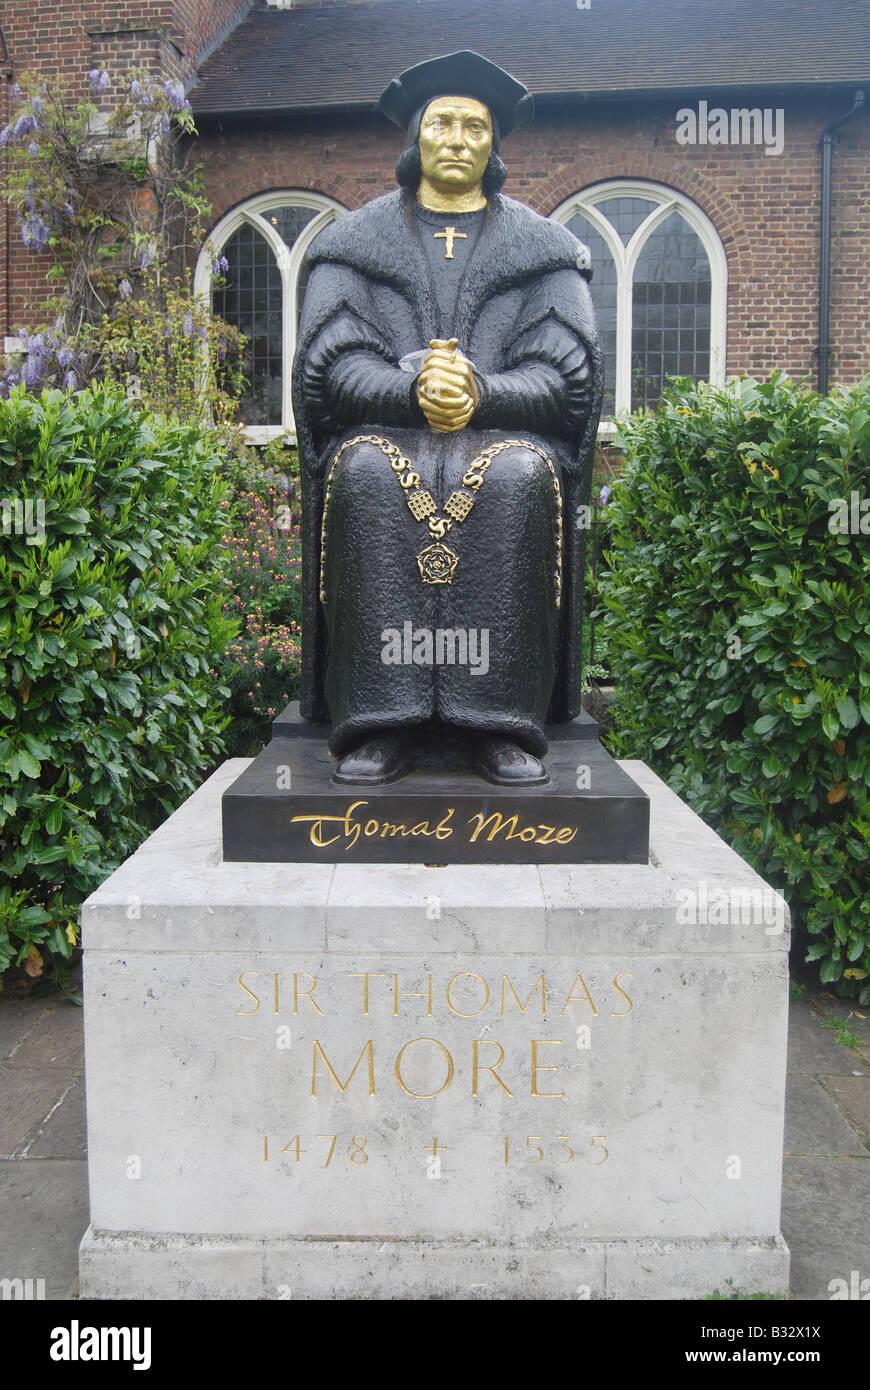 Leslie Cubitt Bevis 'sir Thomas More' - Stock Image